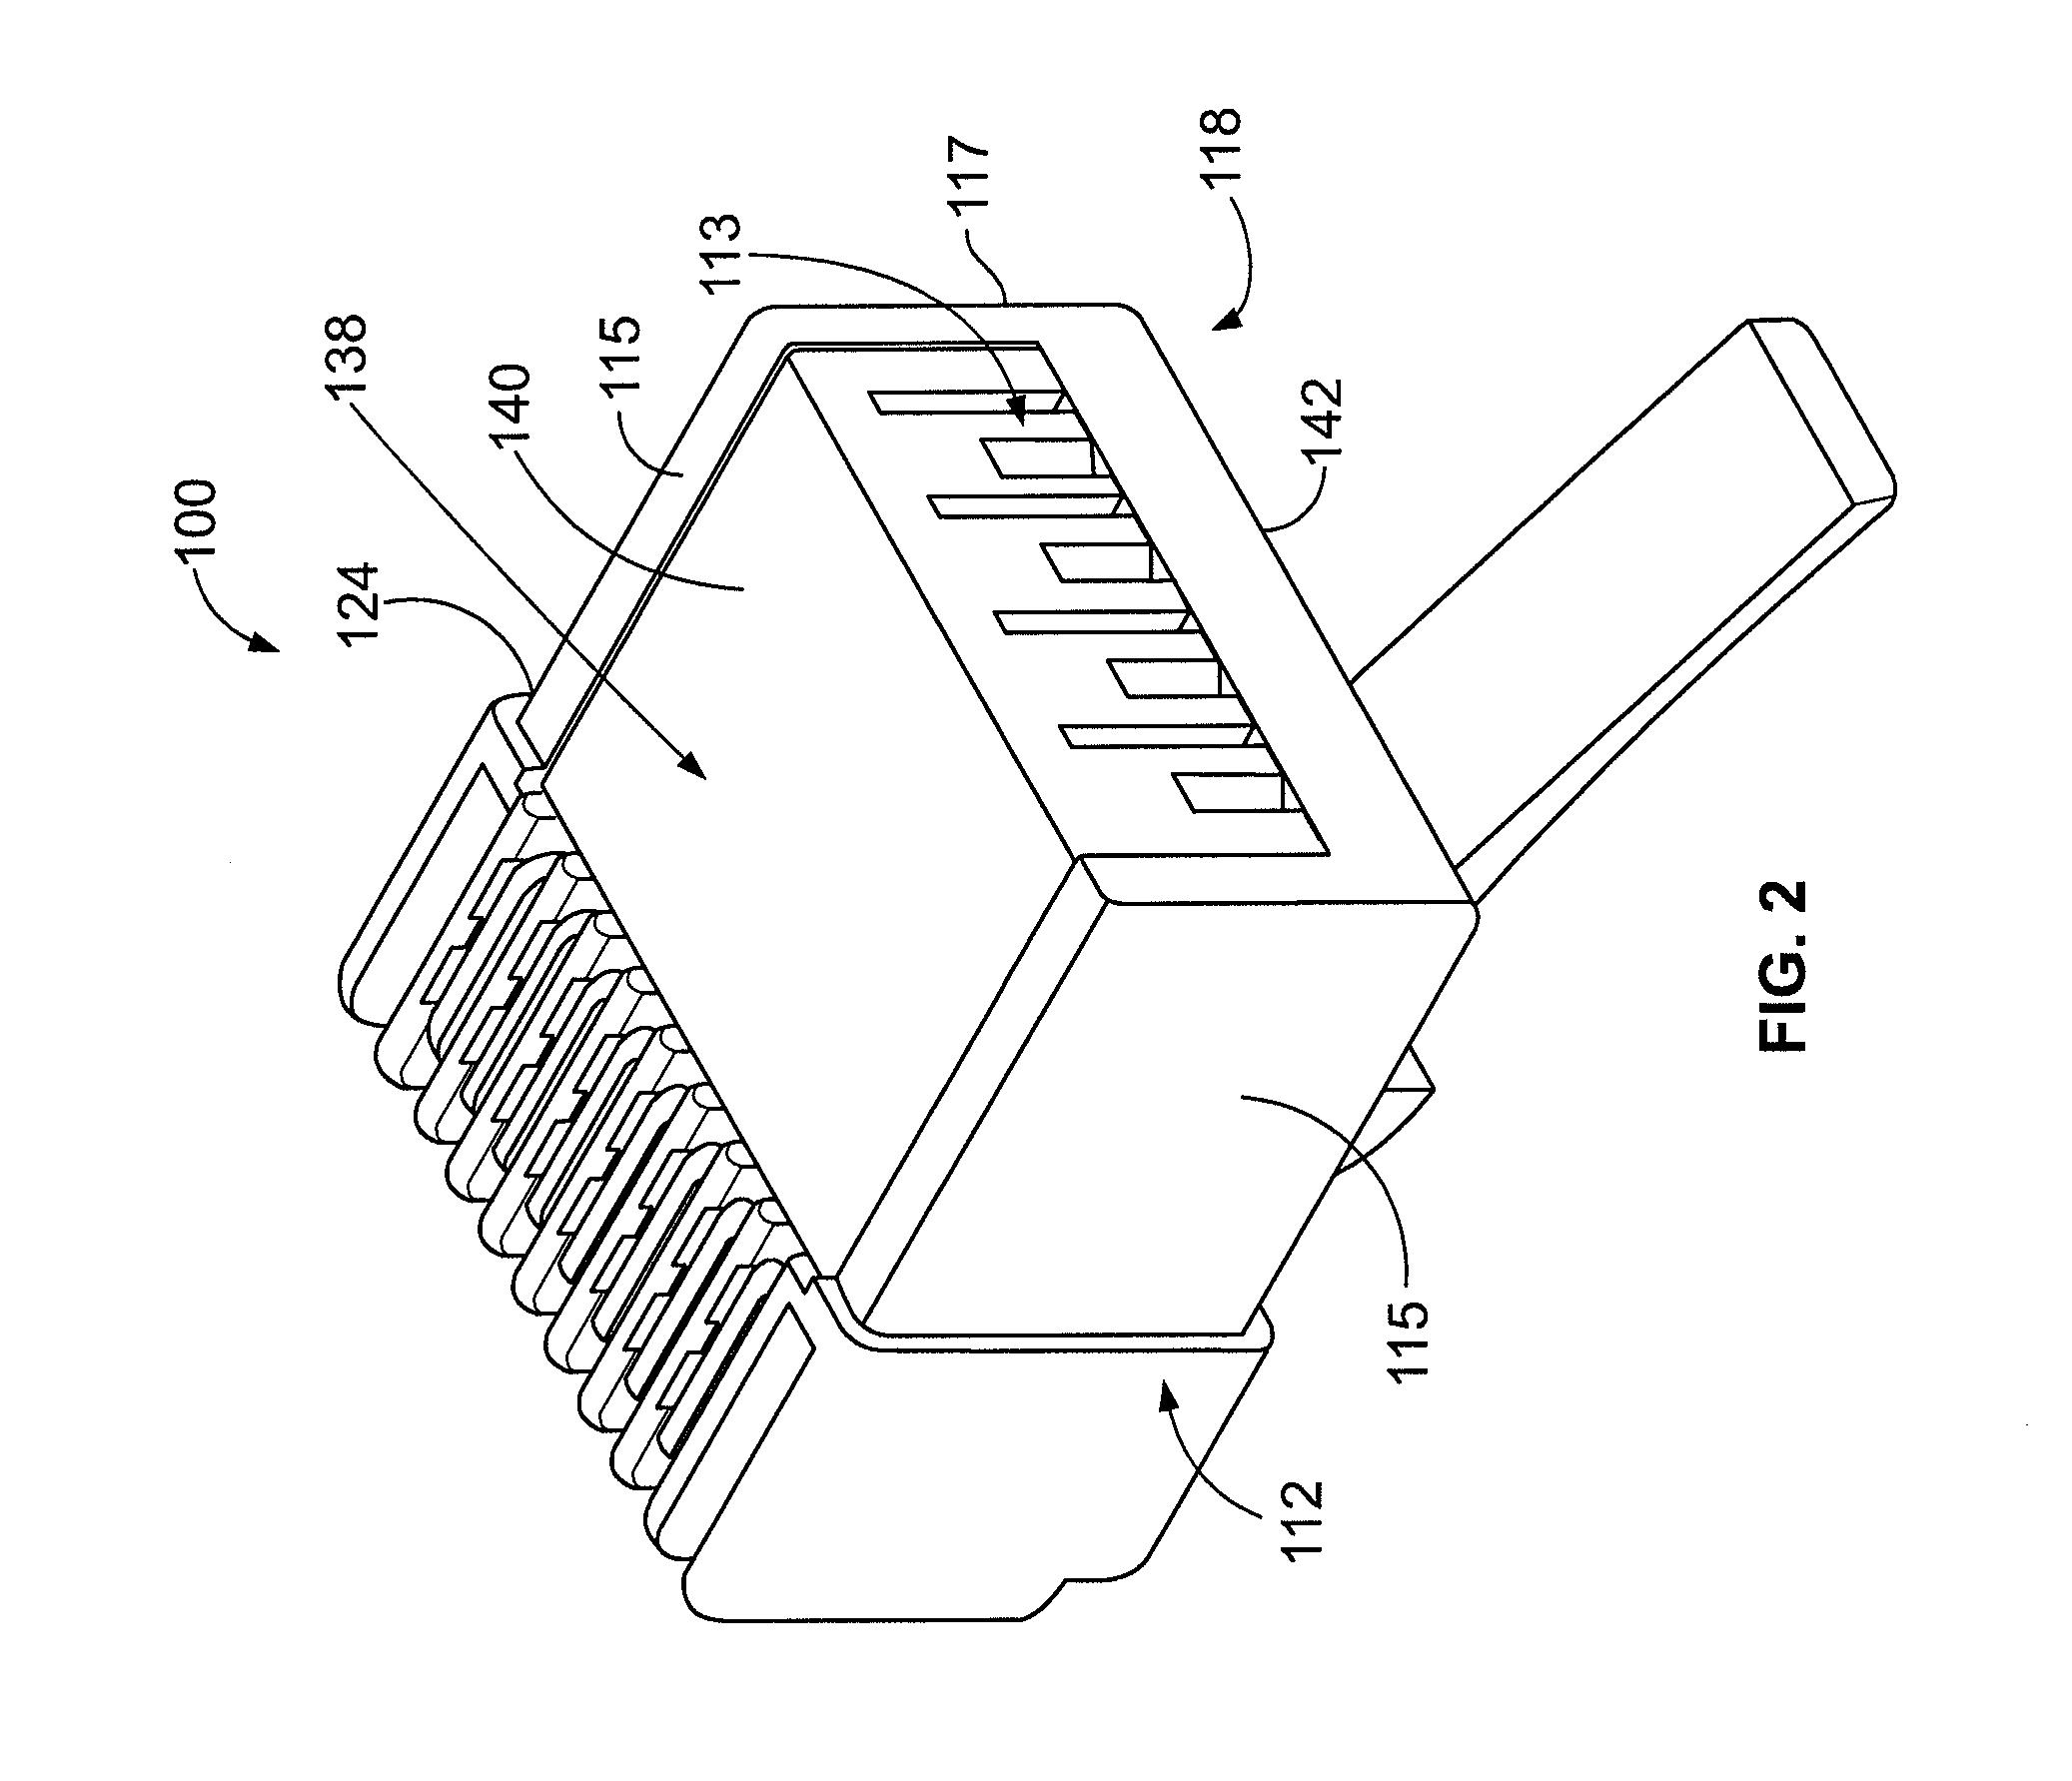 US20140248805A1 20140904 D00002 cat6 standard wiring diagram 1 on cat6 standard wiring diagram